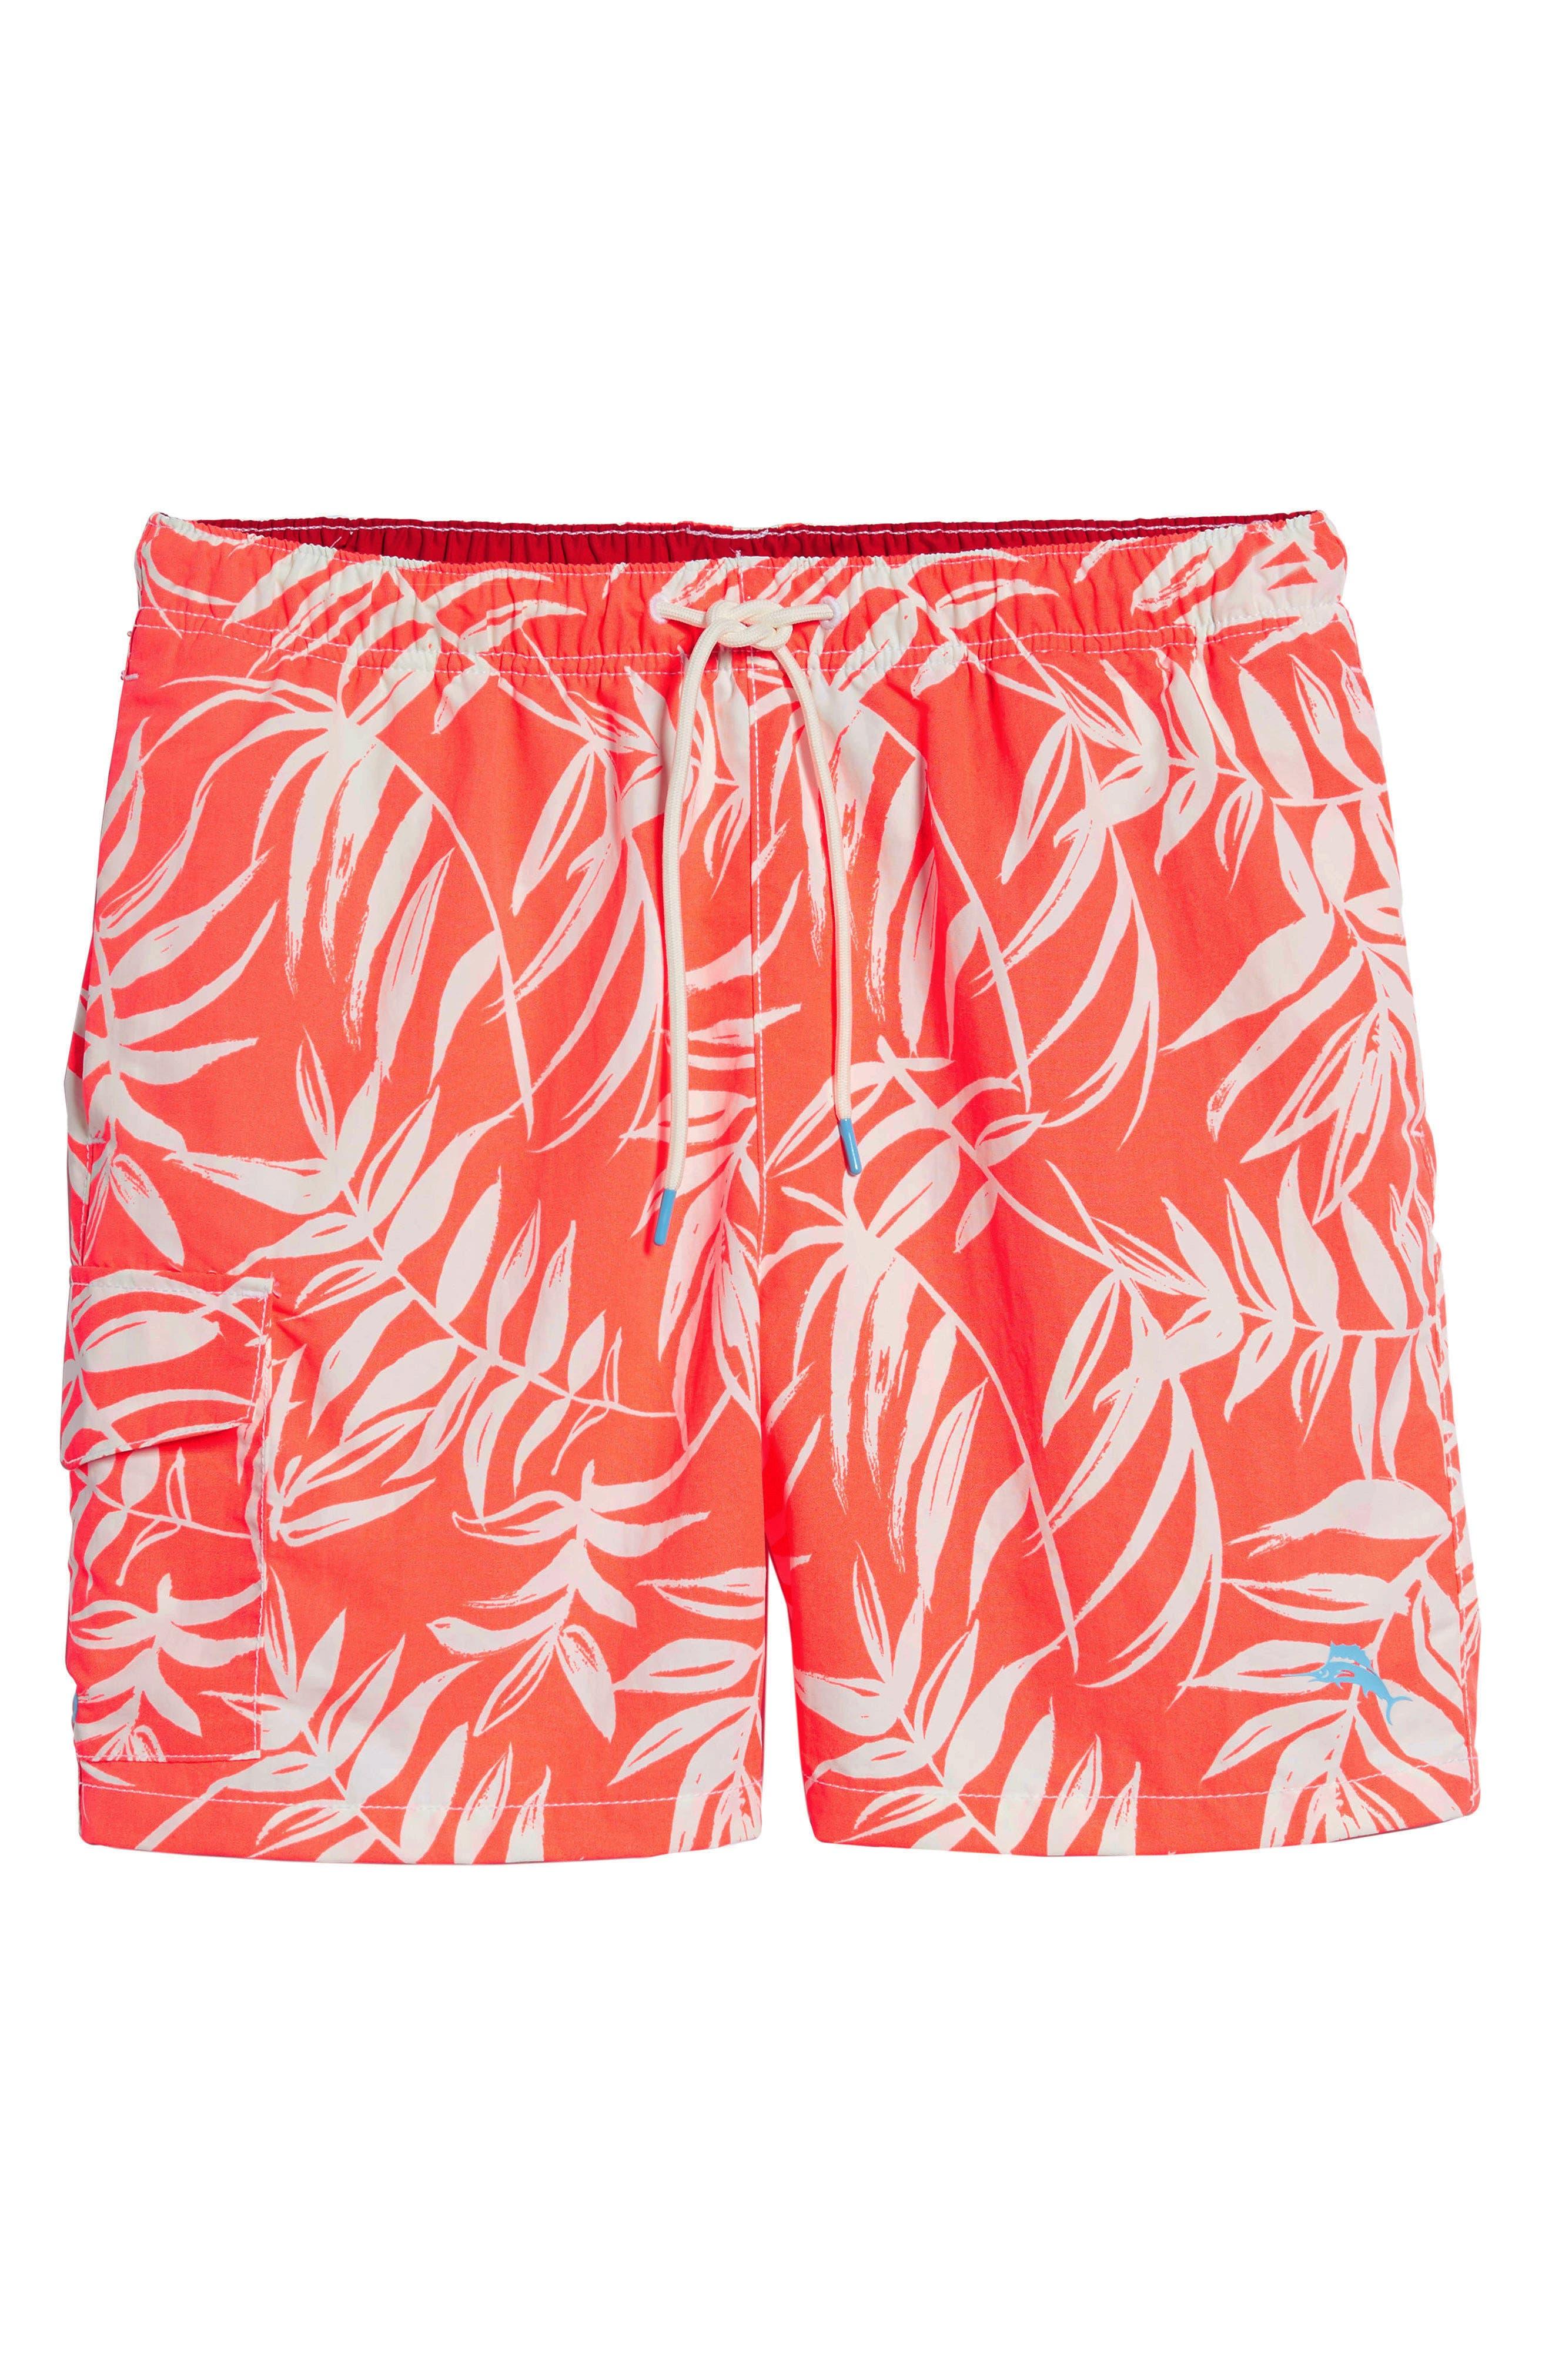 Naples Muy Caliente Swim Trunks,                             Alternate thumbnail 6, color,                             Electric Coral